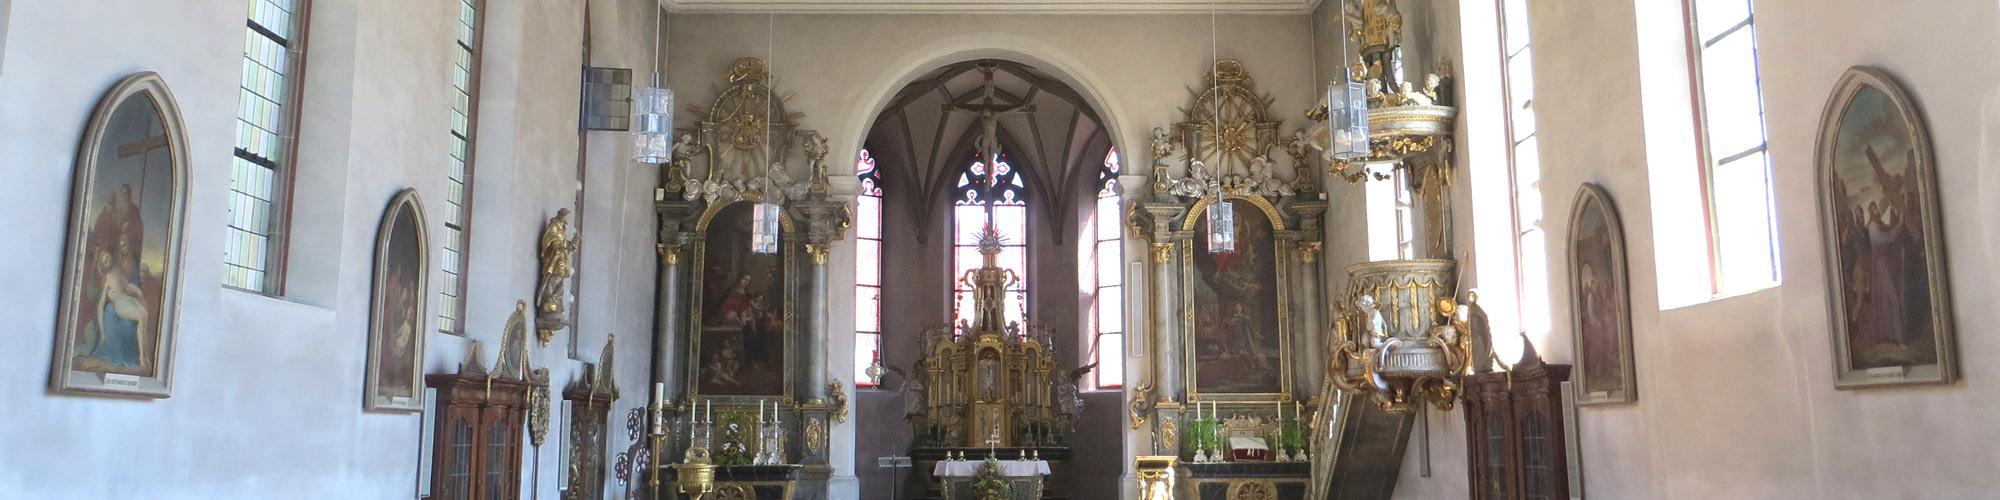 17_Rottendorf_Sankt_Vitus_Innenraum©WürzburgWiki Wolfgang